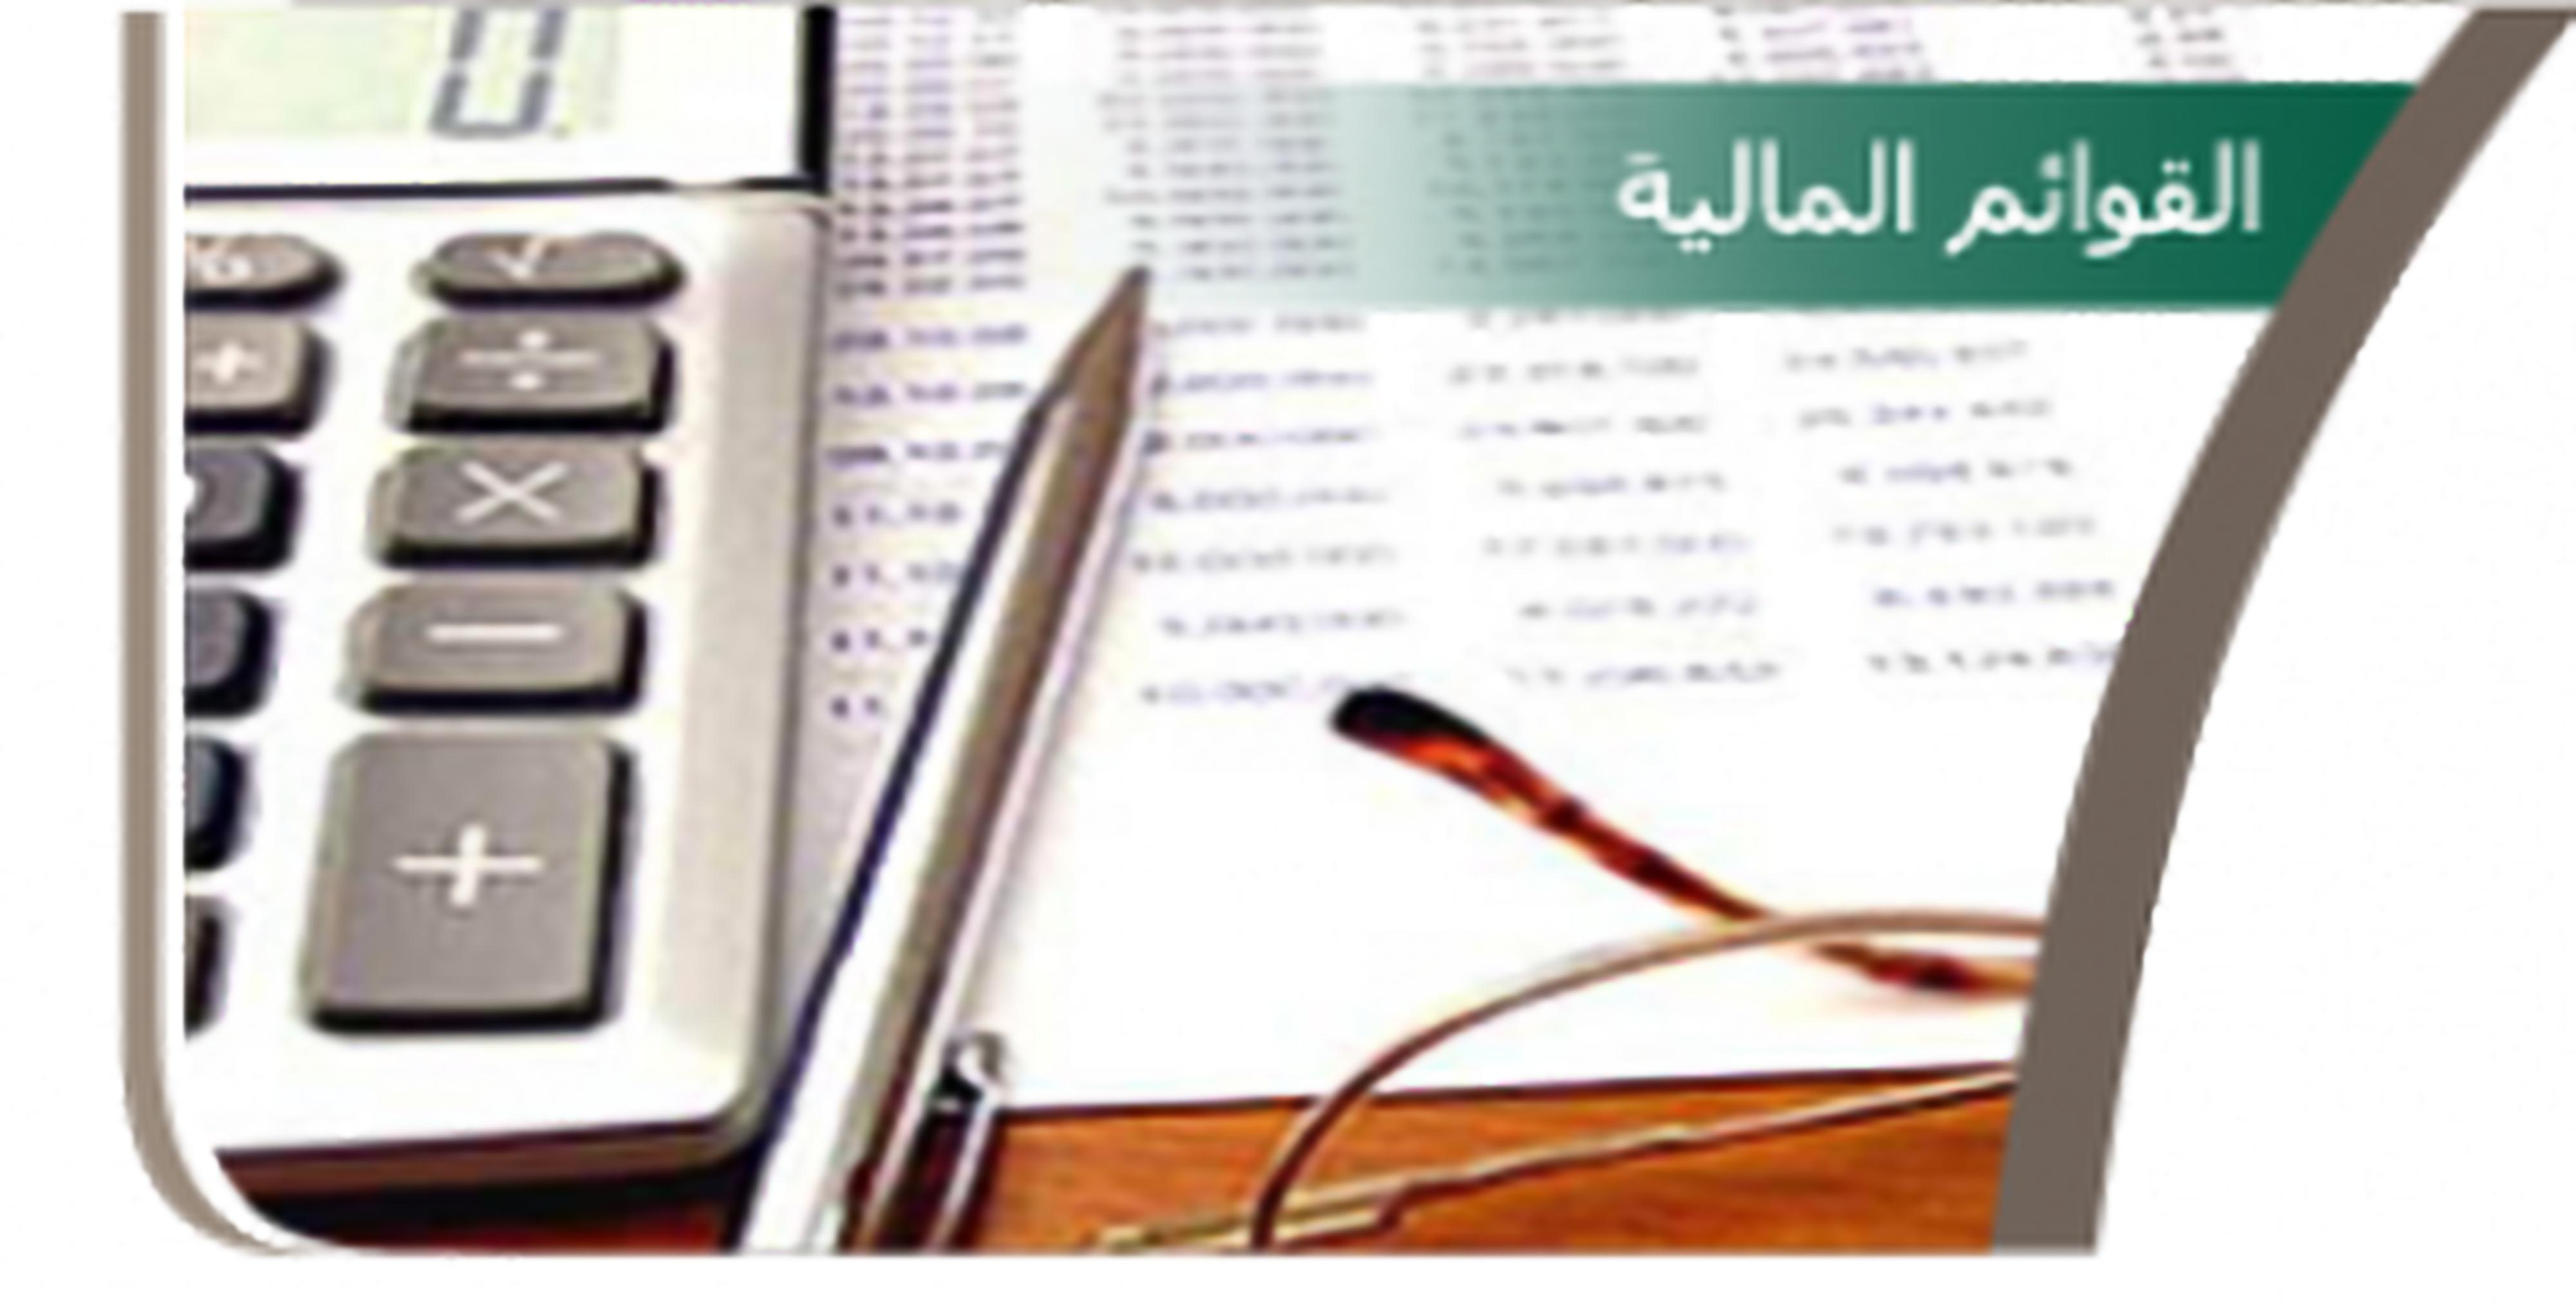 Photo of القوائم المالية و تحليل القوائم المالية وكل ما تريد معرفته عن القوائم المالية